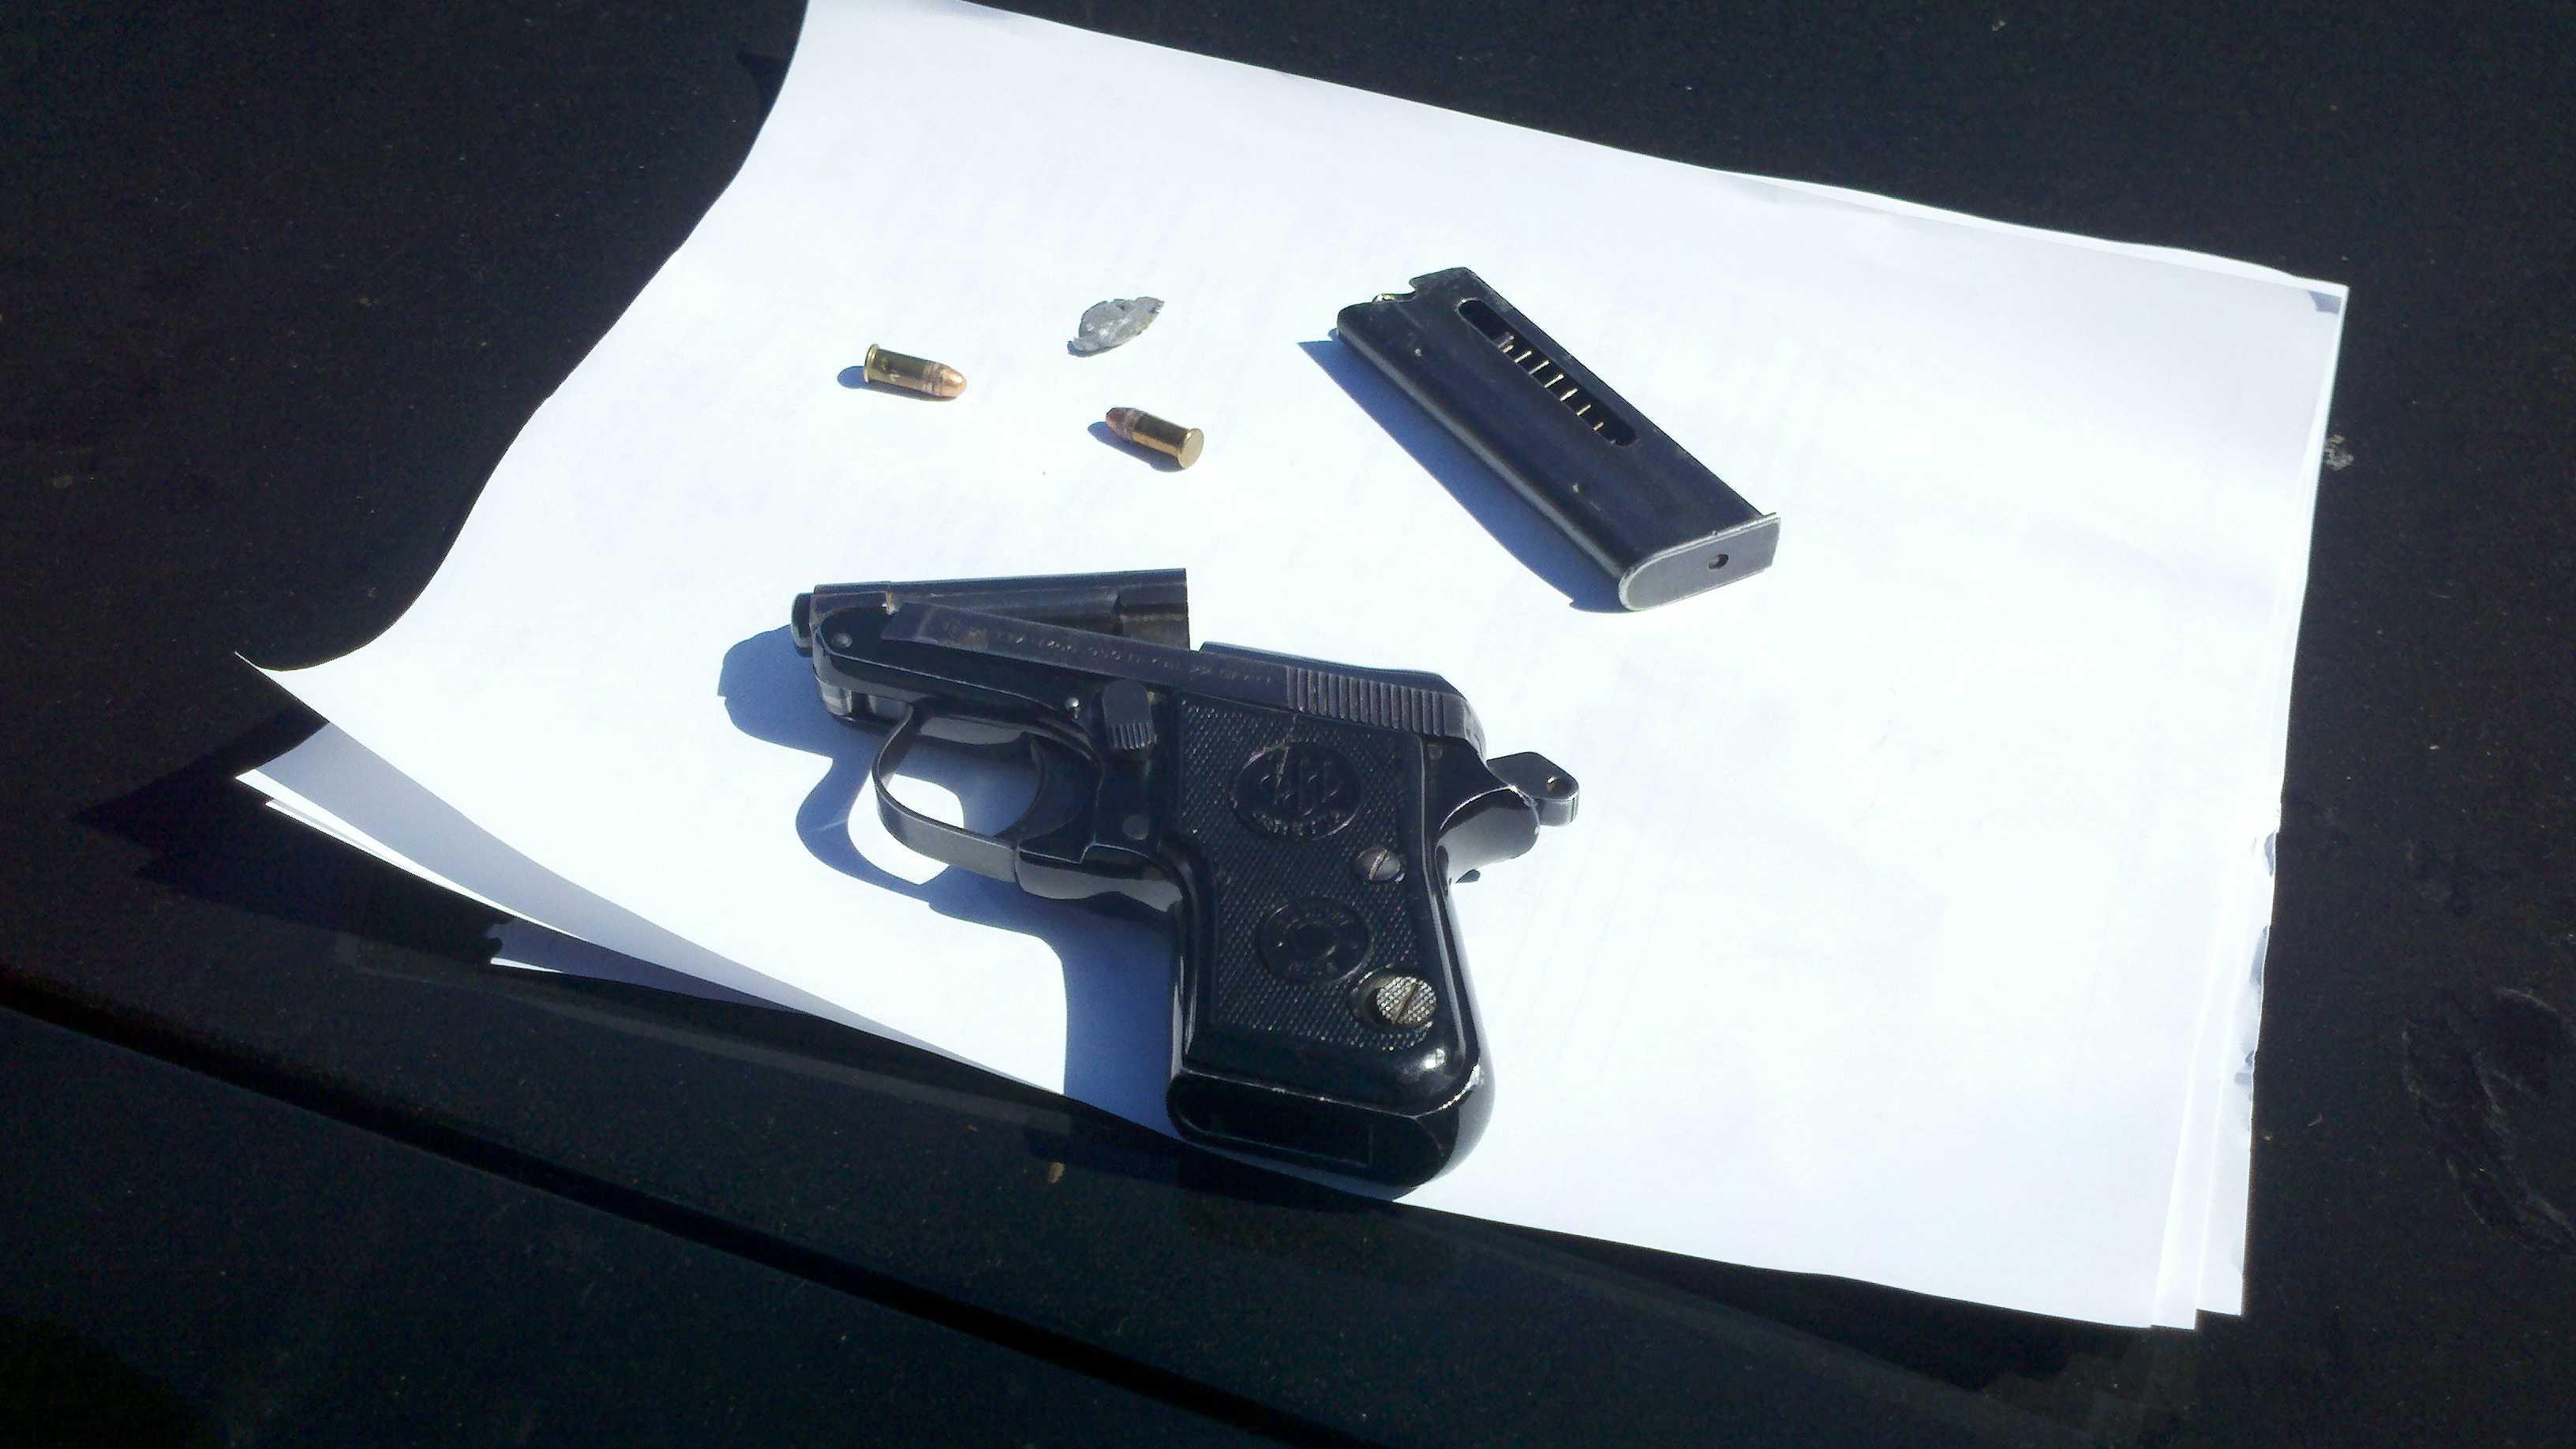 Gun to school in Stockton